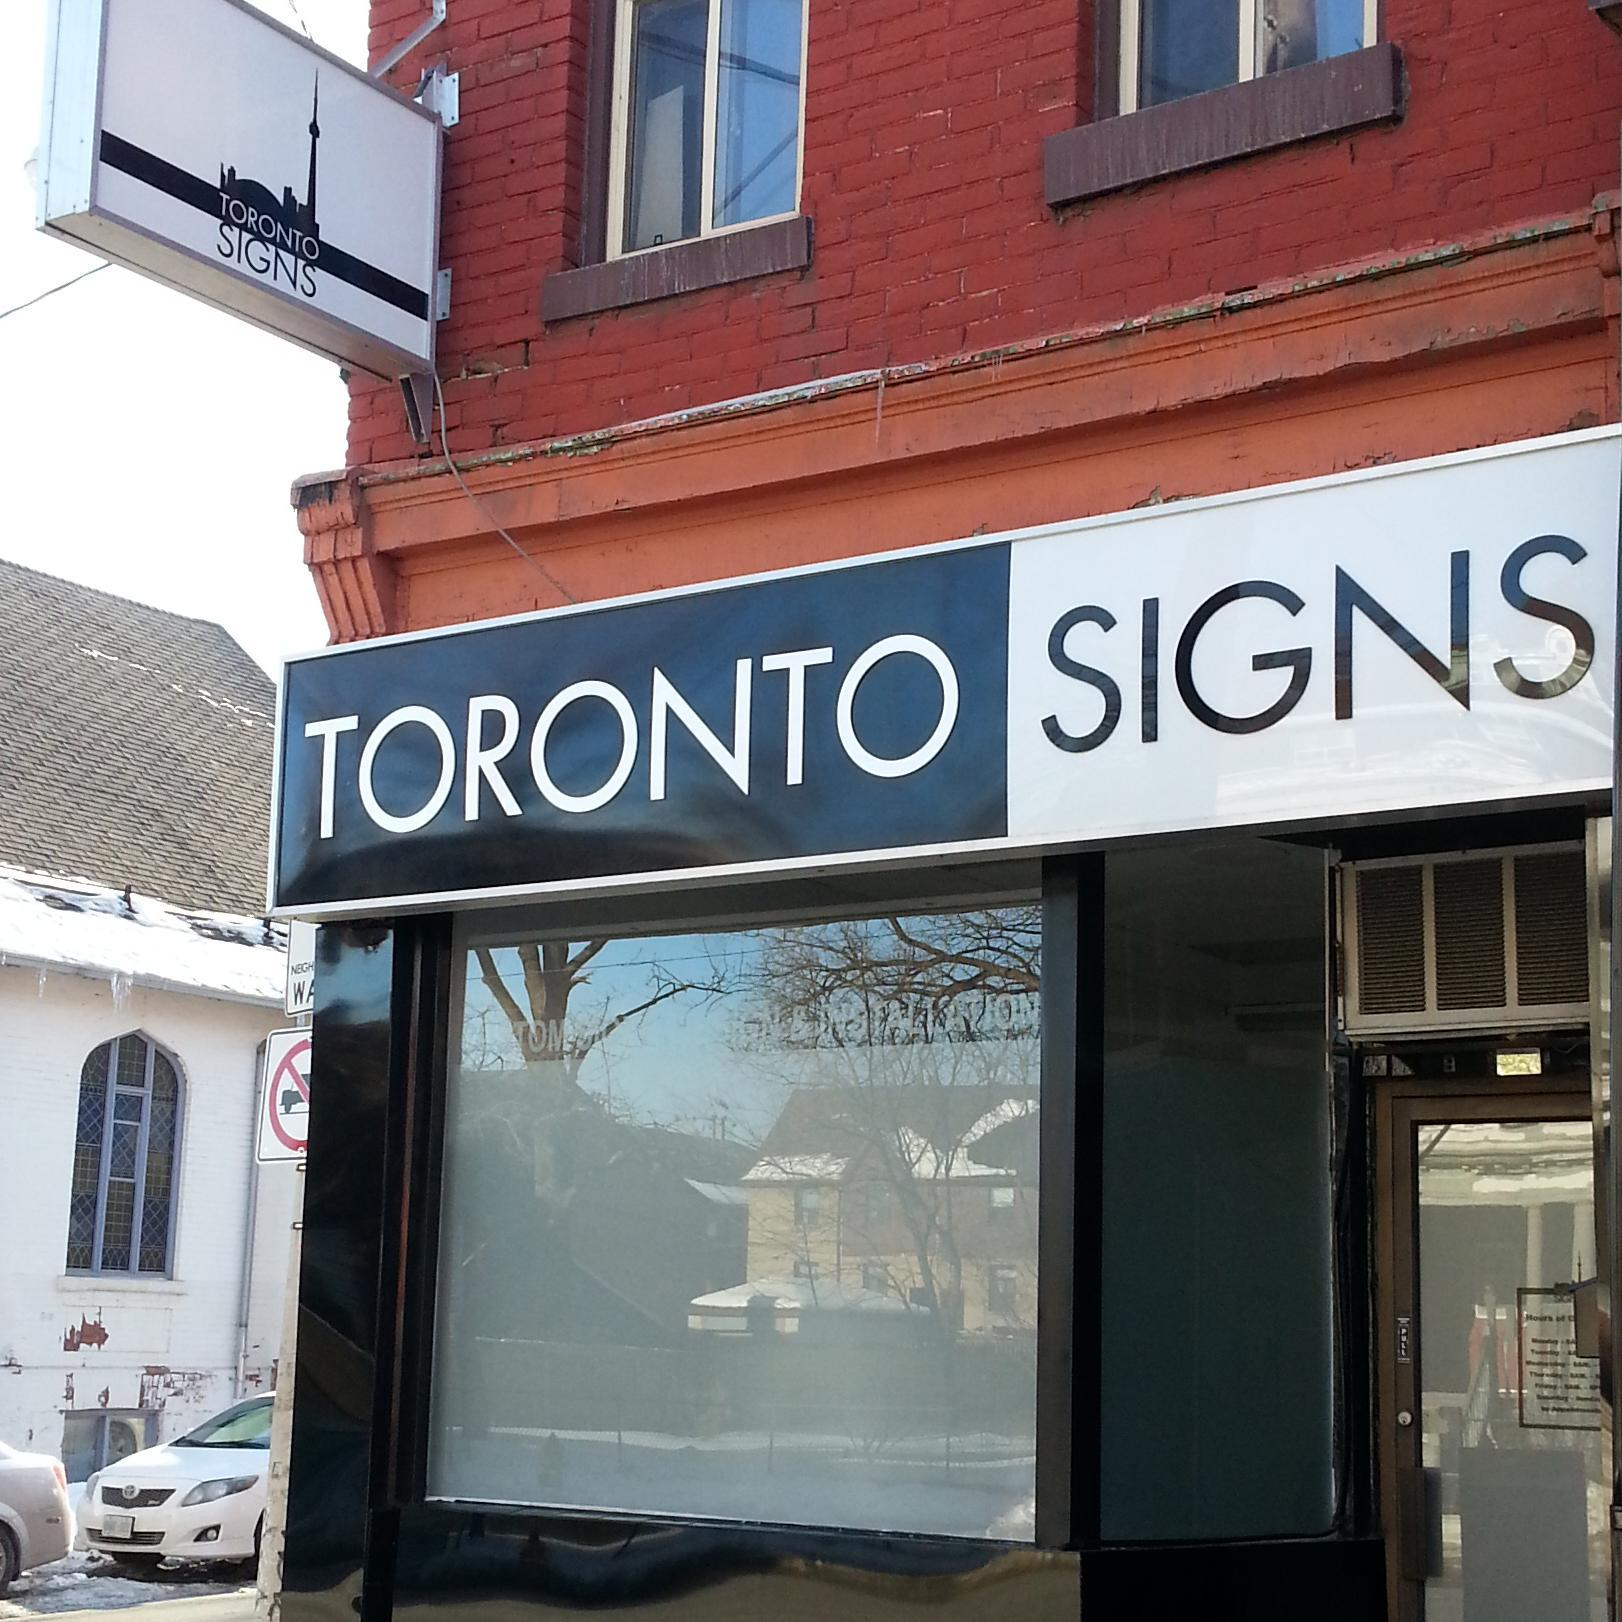 Toronto Signs on Twitter: